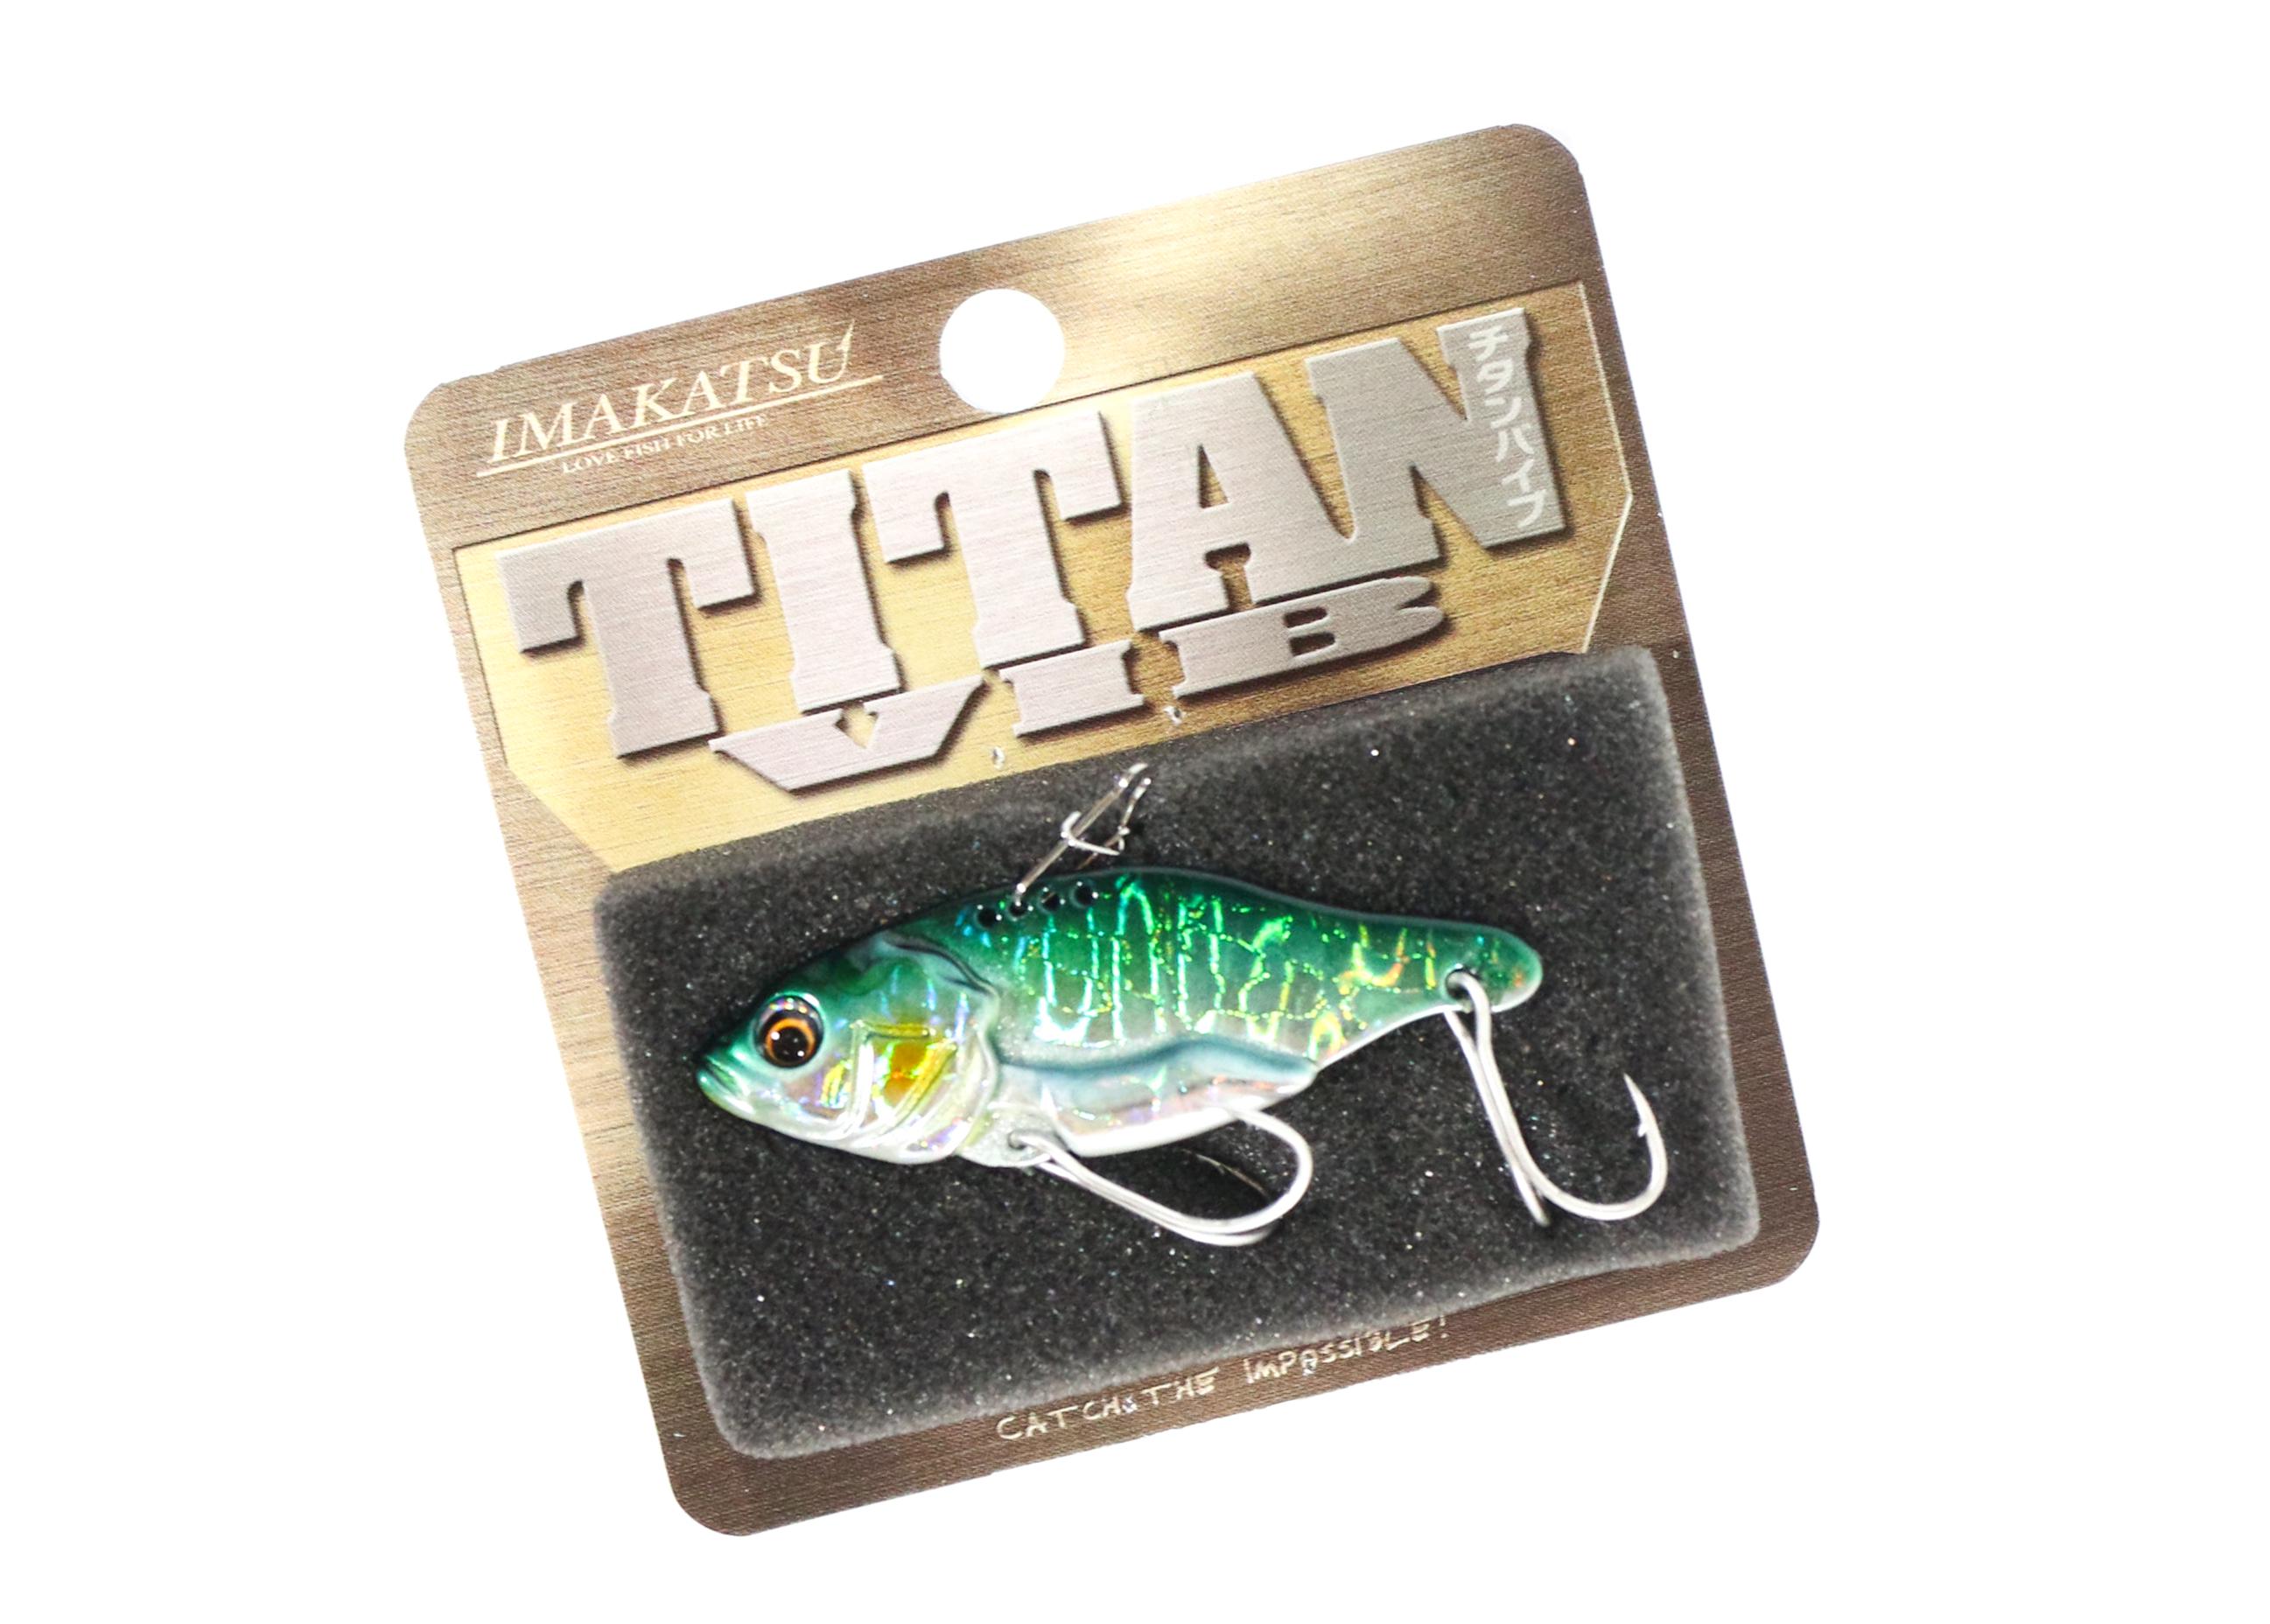 Sale Imakatsu Titan Vib Metal Vibration 3/8 oz Sinking Lure MV-12 (4844)